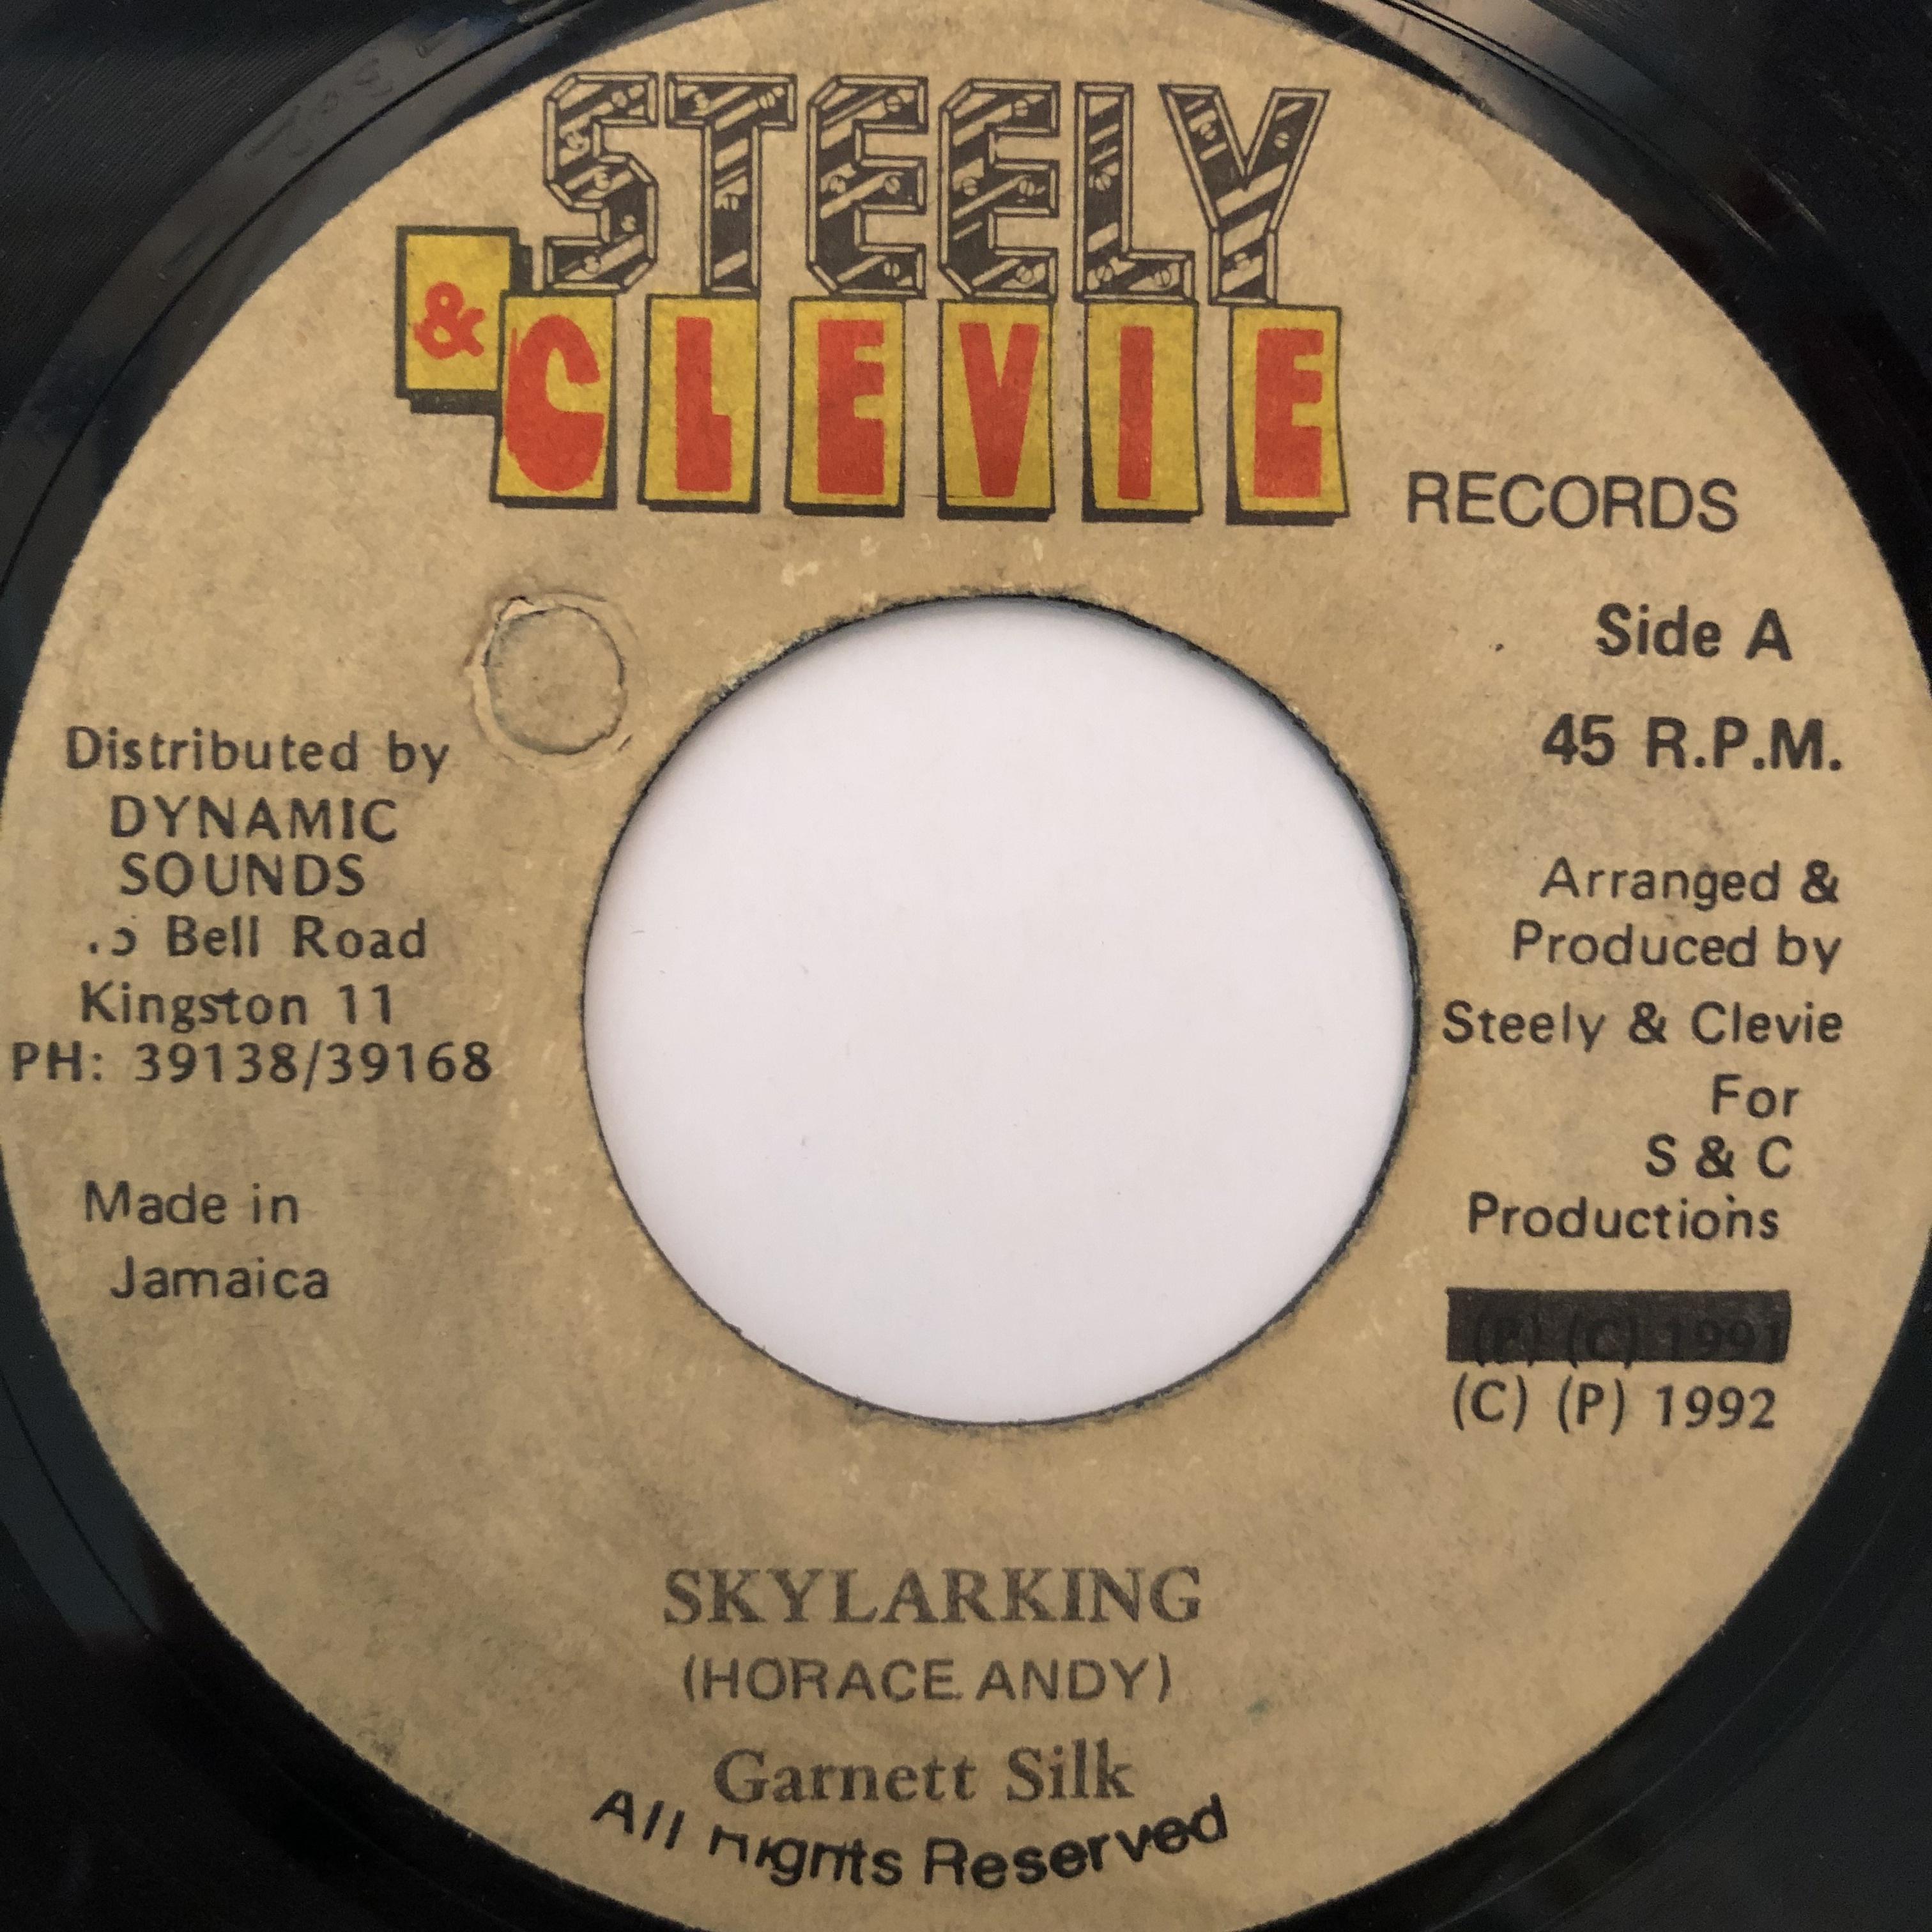 Garnett Silk(ガーネットシルク) - Skylarking【7-20258】